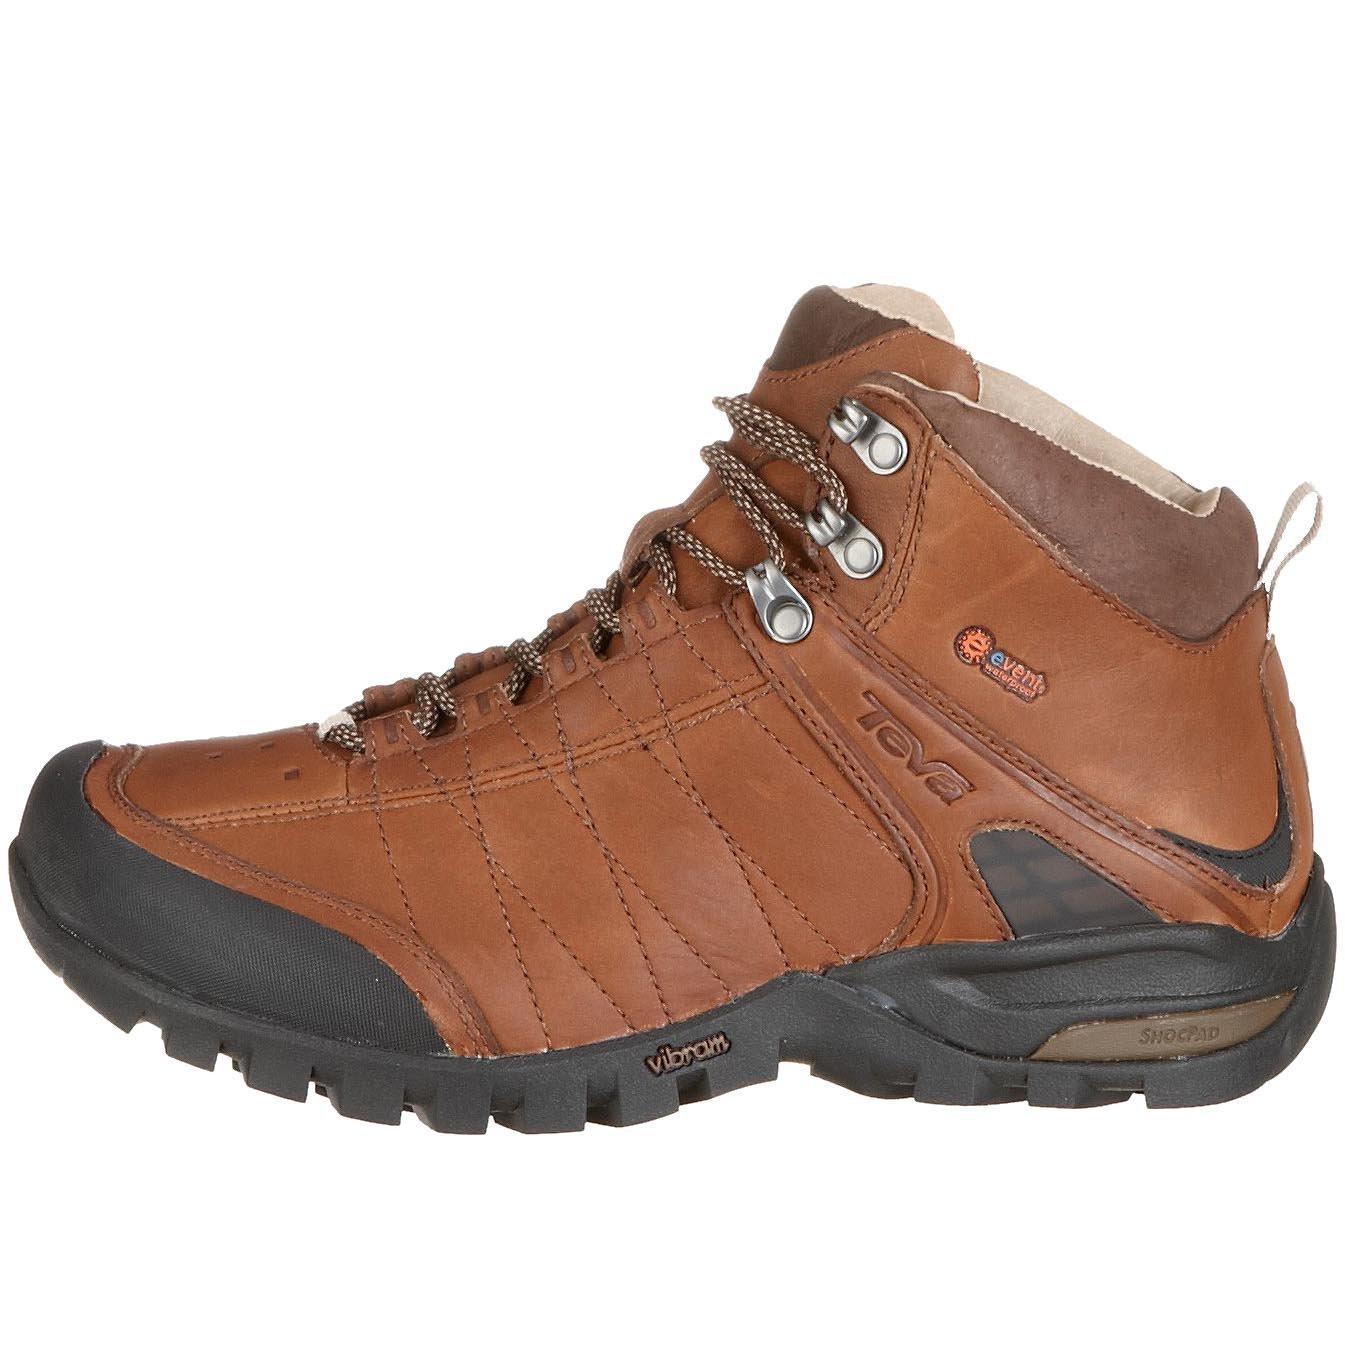 303d72766ea0 Teva Men s Riva Leather Mid Event Hiking Boot